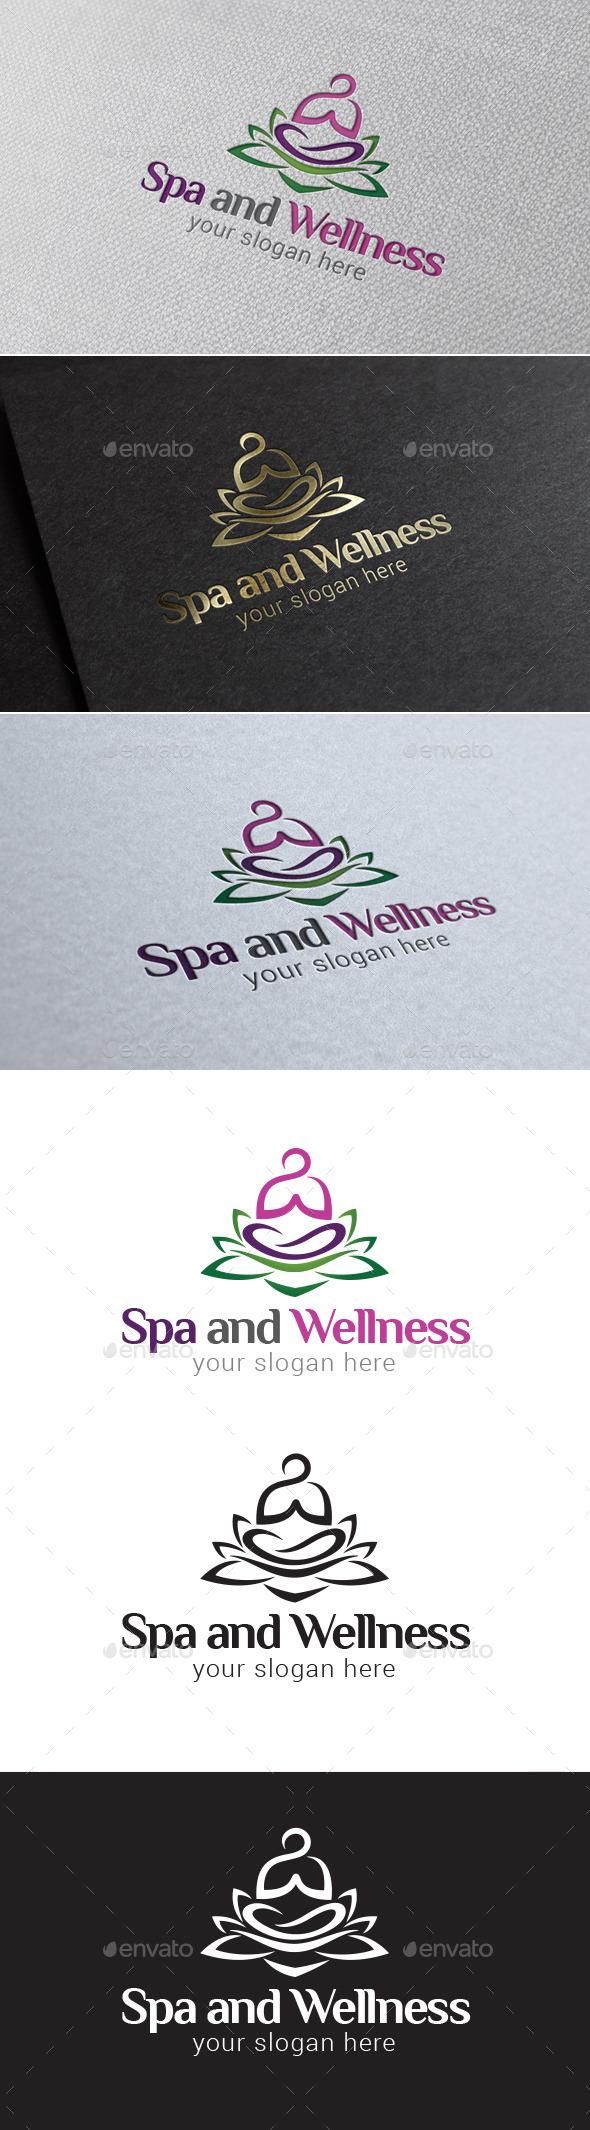 Spa and Wellness Logo Template - Symbols Logo Templates